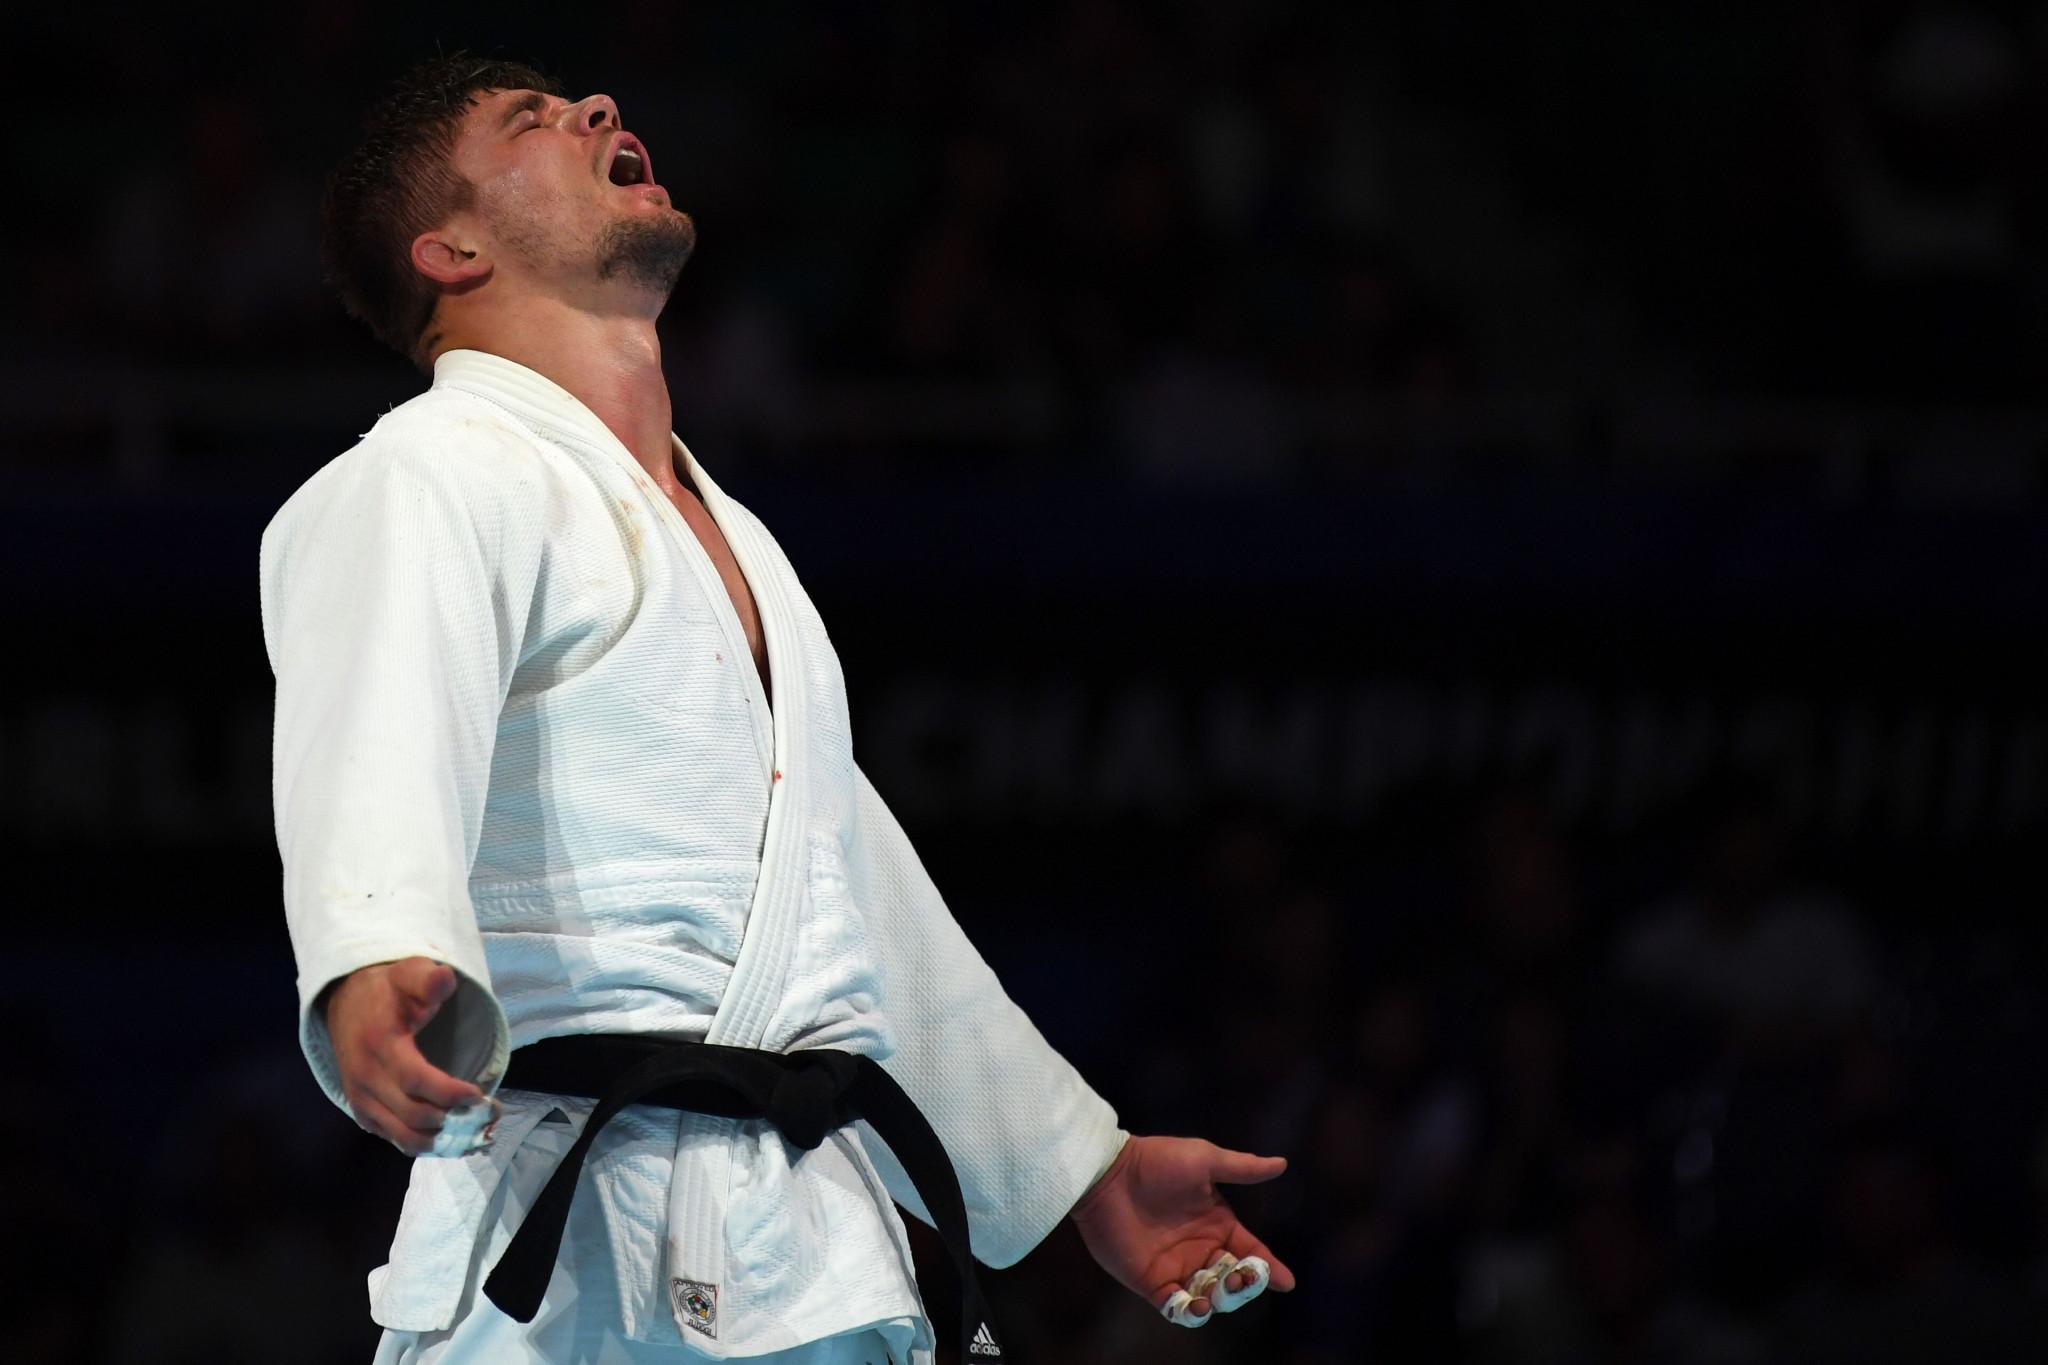 Noël van 't End celebrates victory after an enthralling under-90kg final ©Getty Images